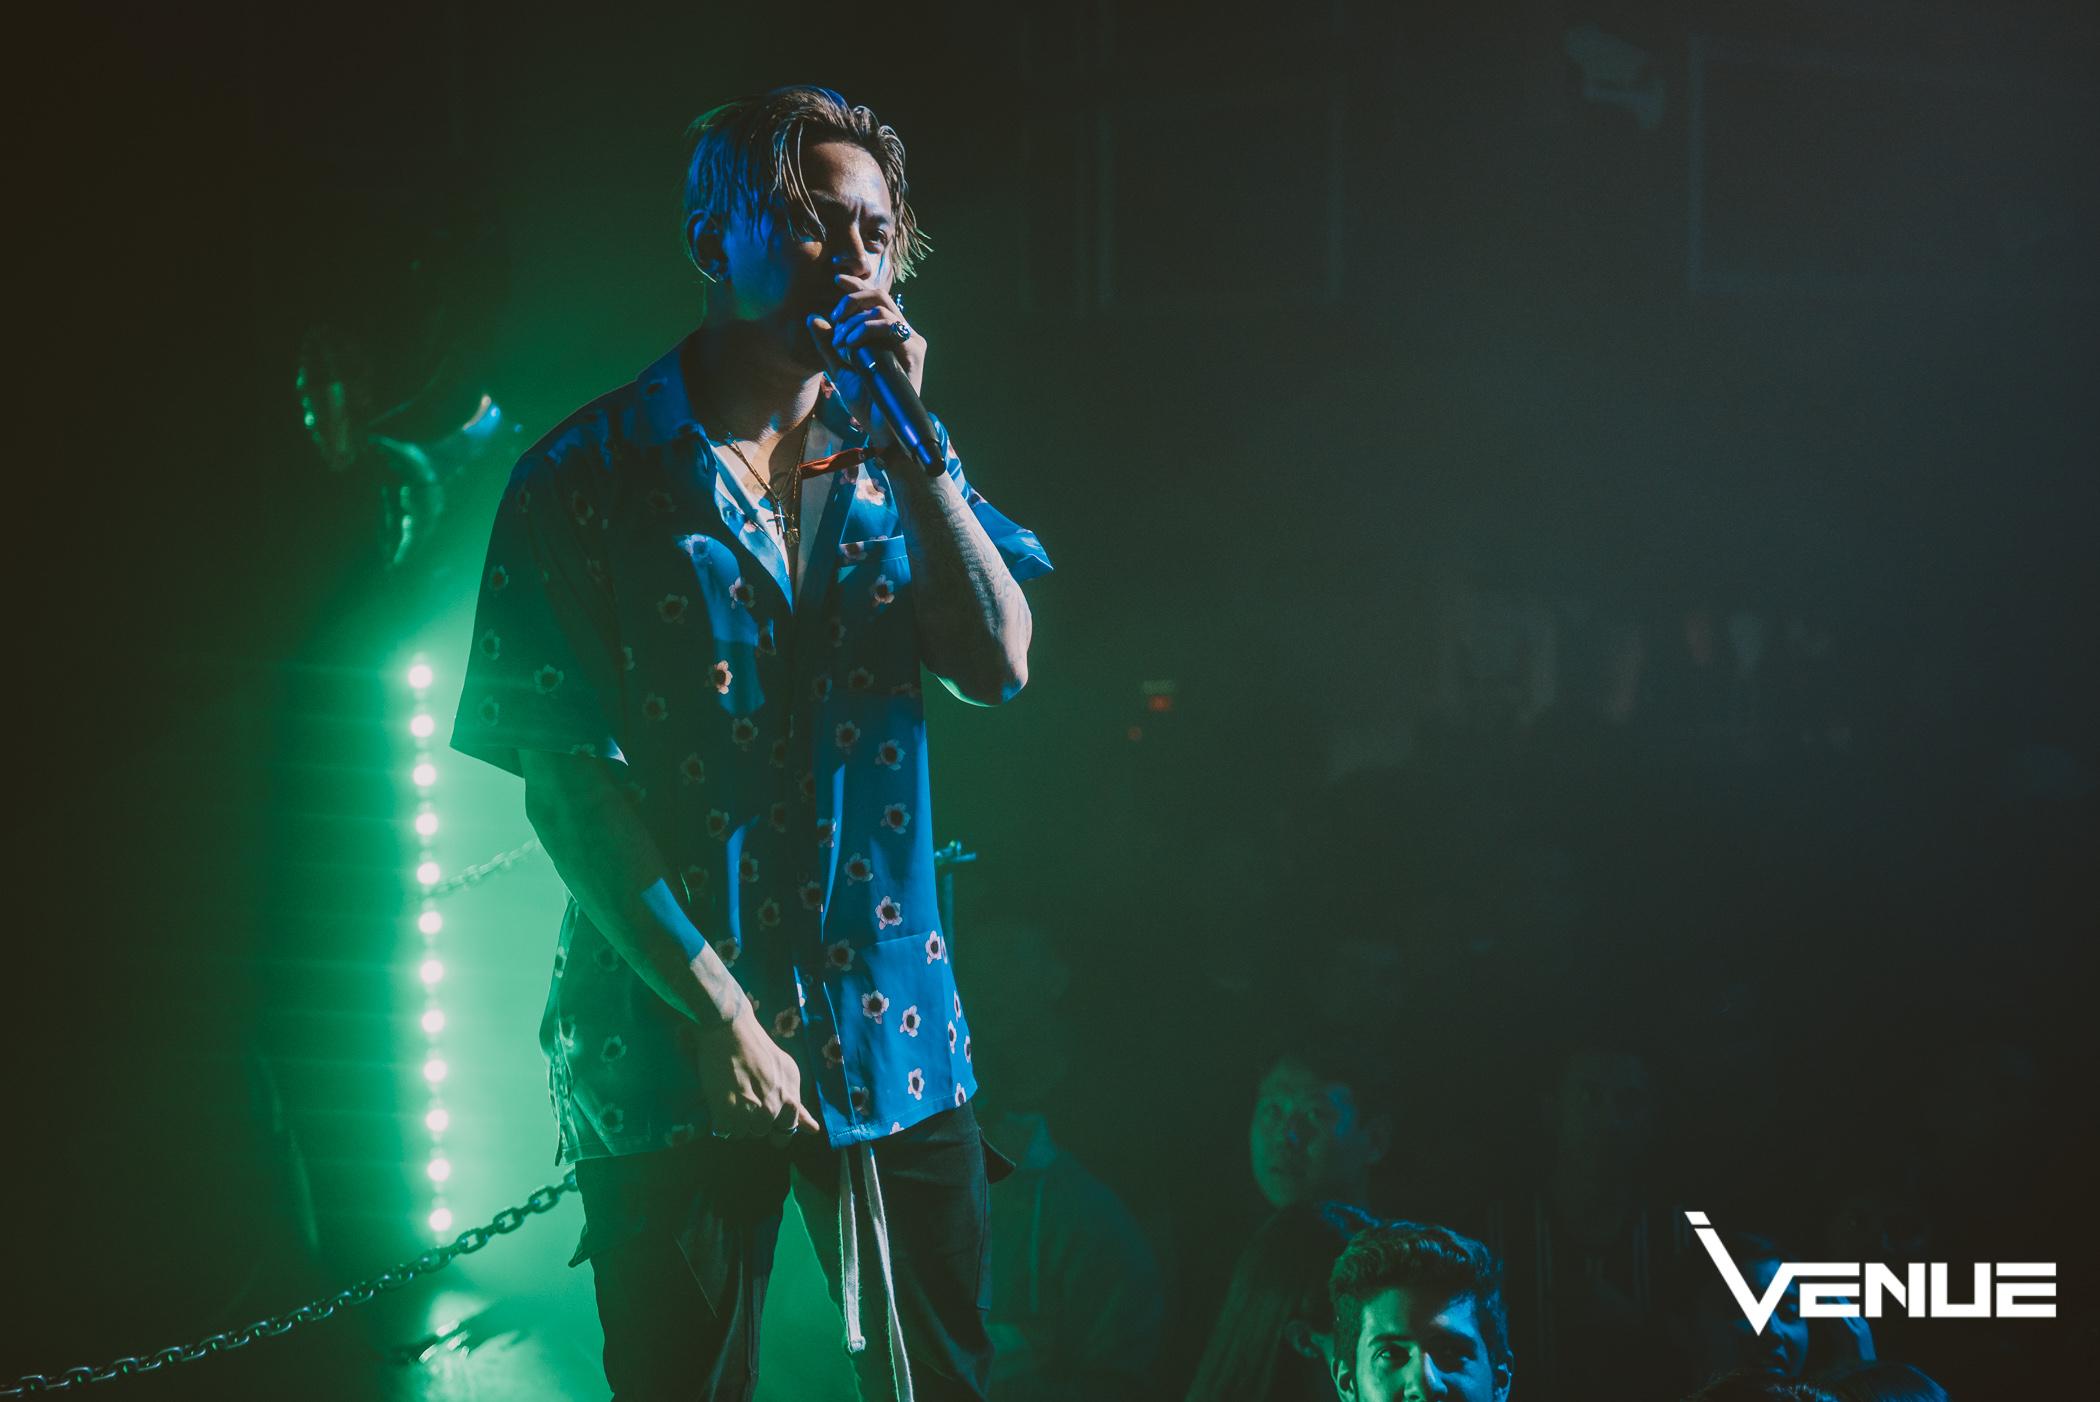 VENUE-Embrvce-Saturday-Manila_Grey-Timothy_Nguyen-20180609-84.jpg